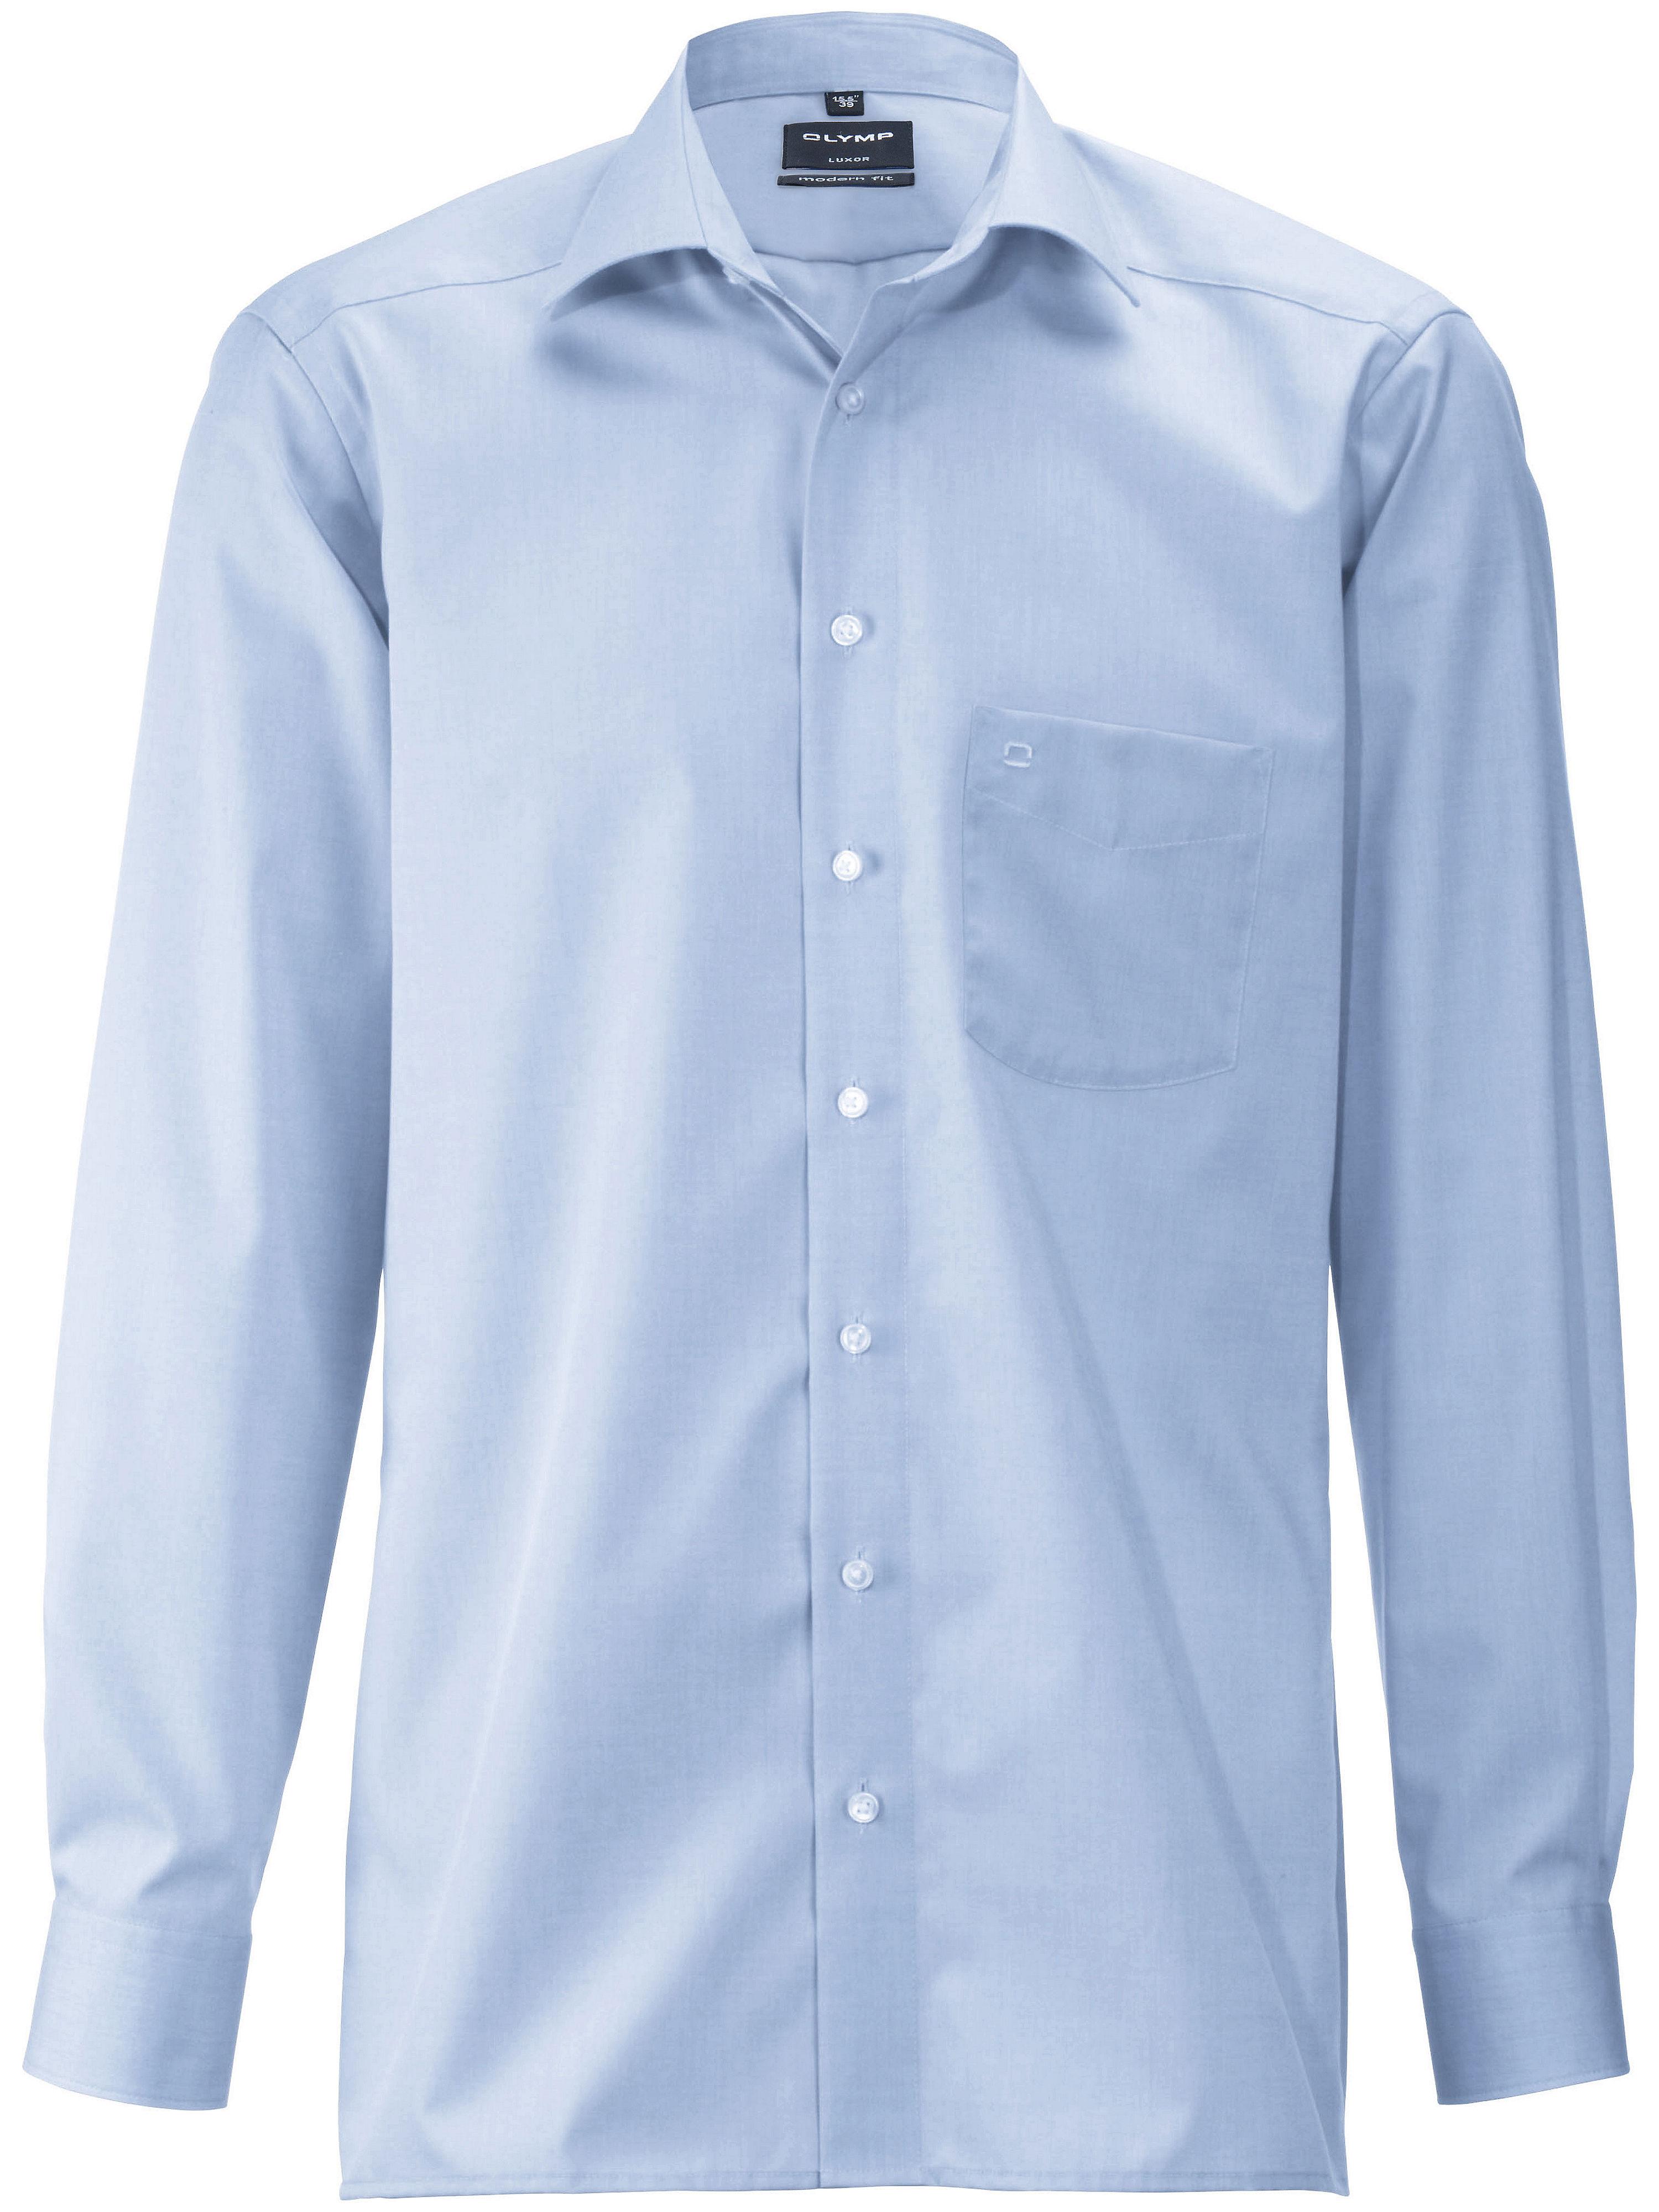 La chemise  Olymp Luxor bleu